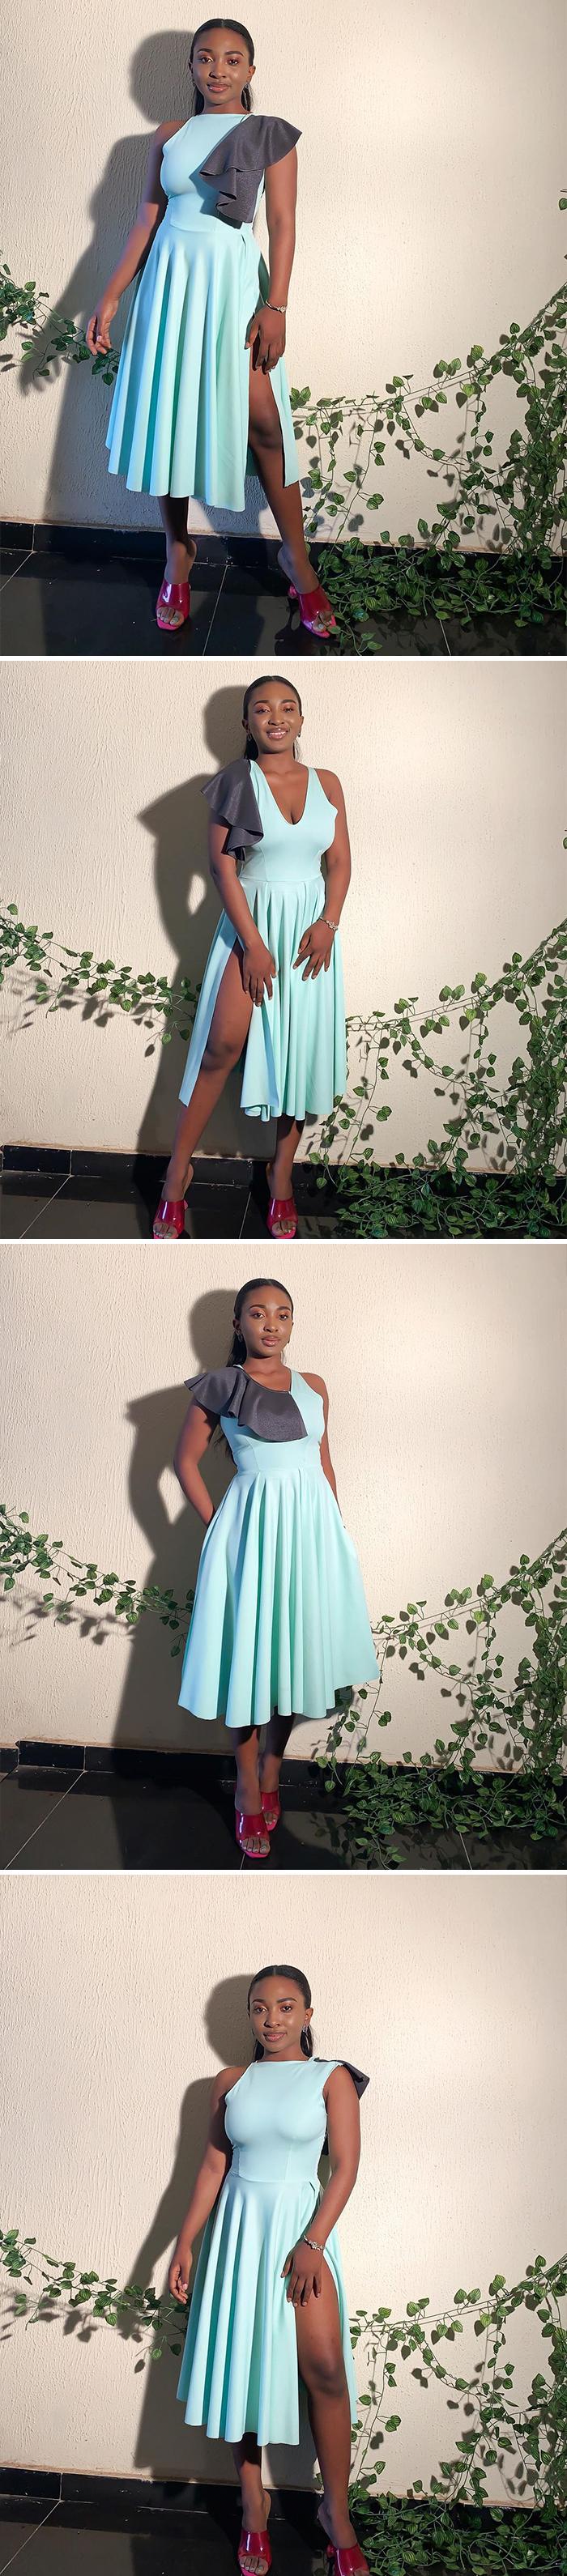 One-Dress-Different-Styles-Oyinda-Akinfenwa